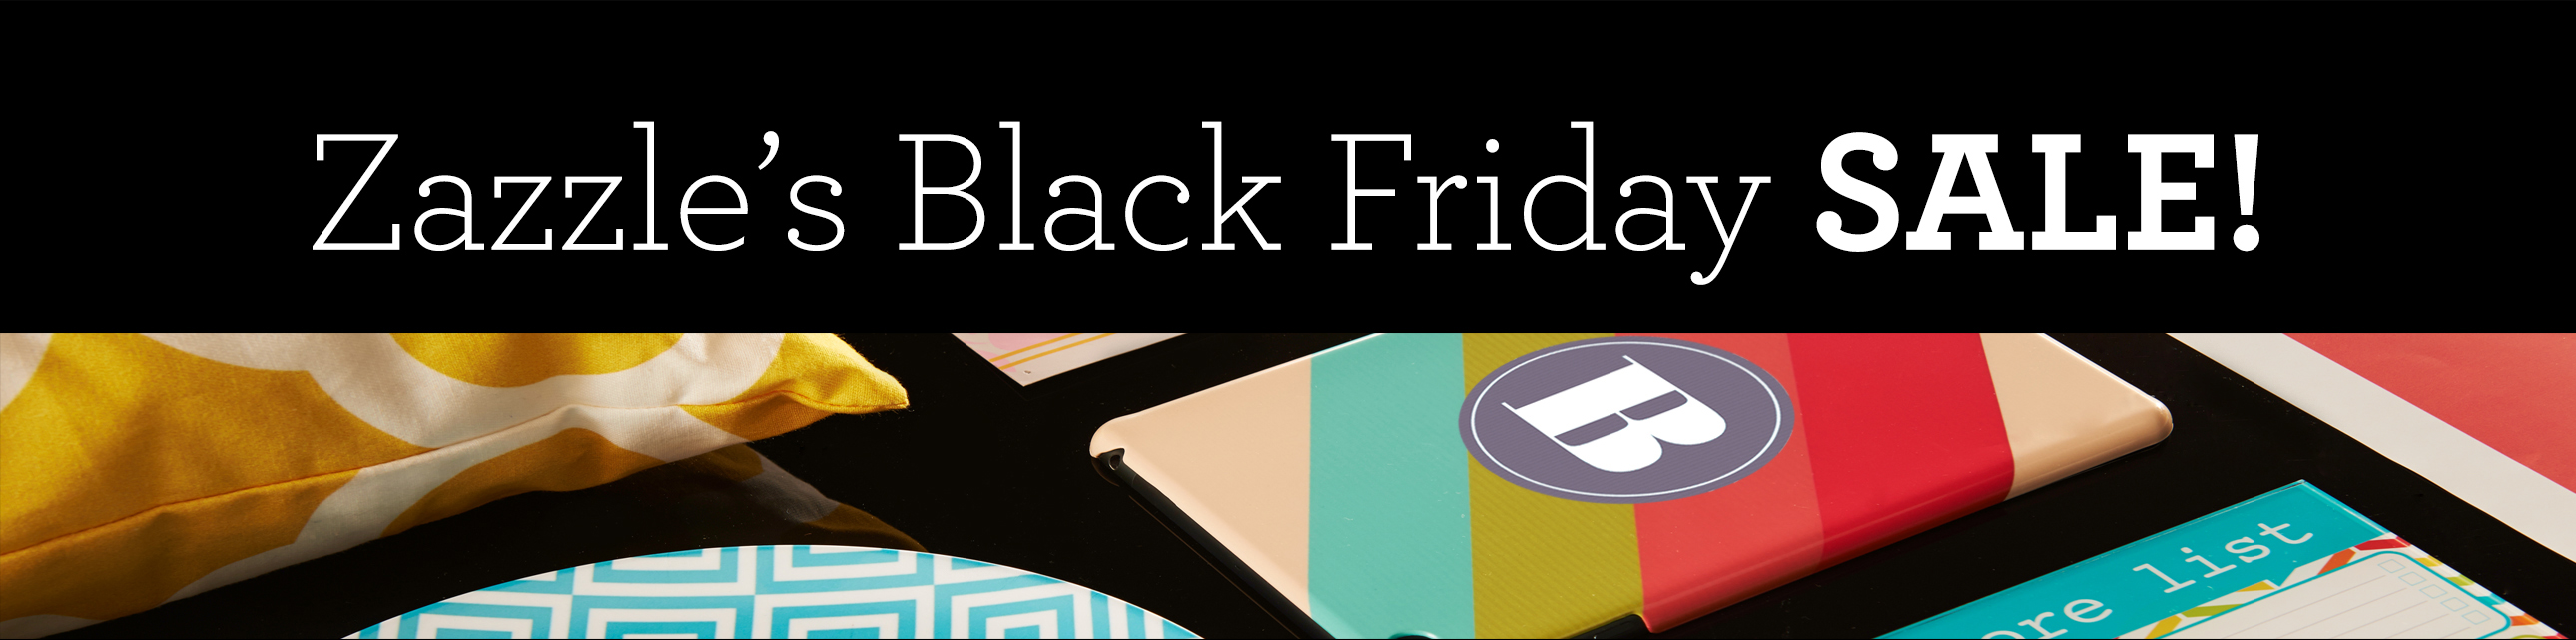 Zazzle Black Friday